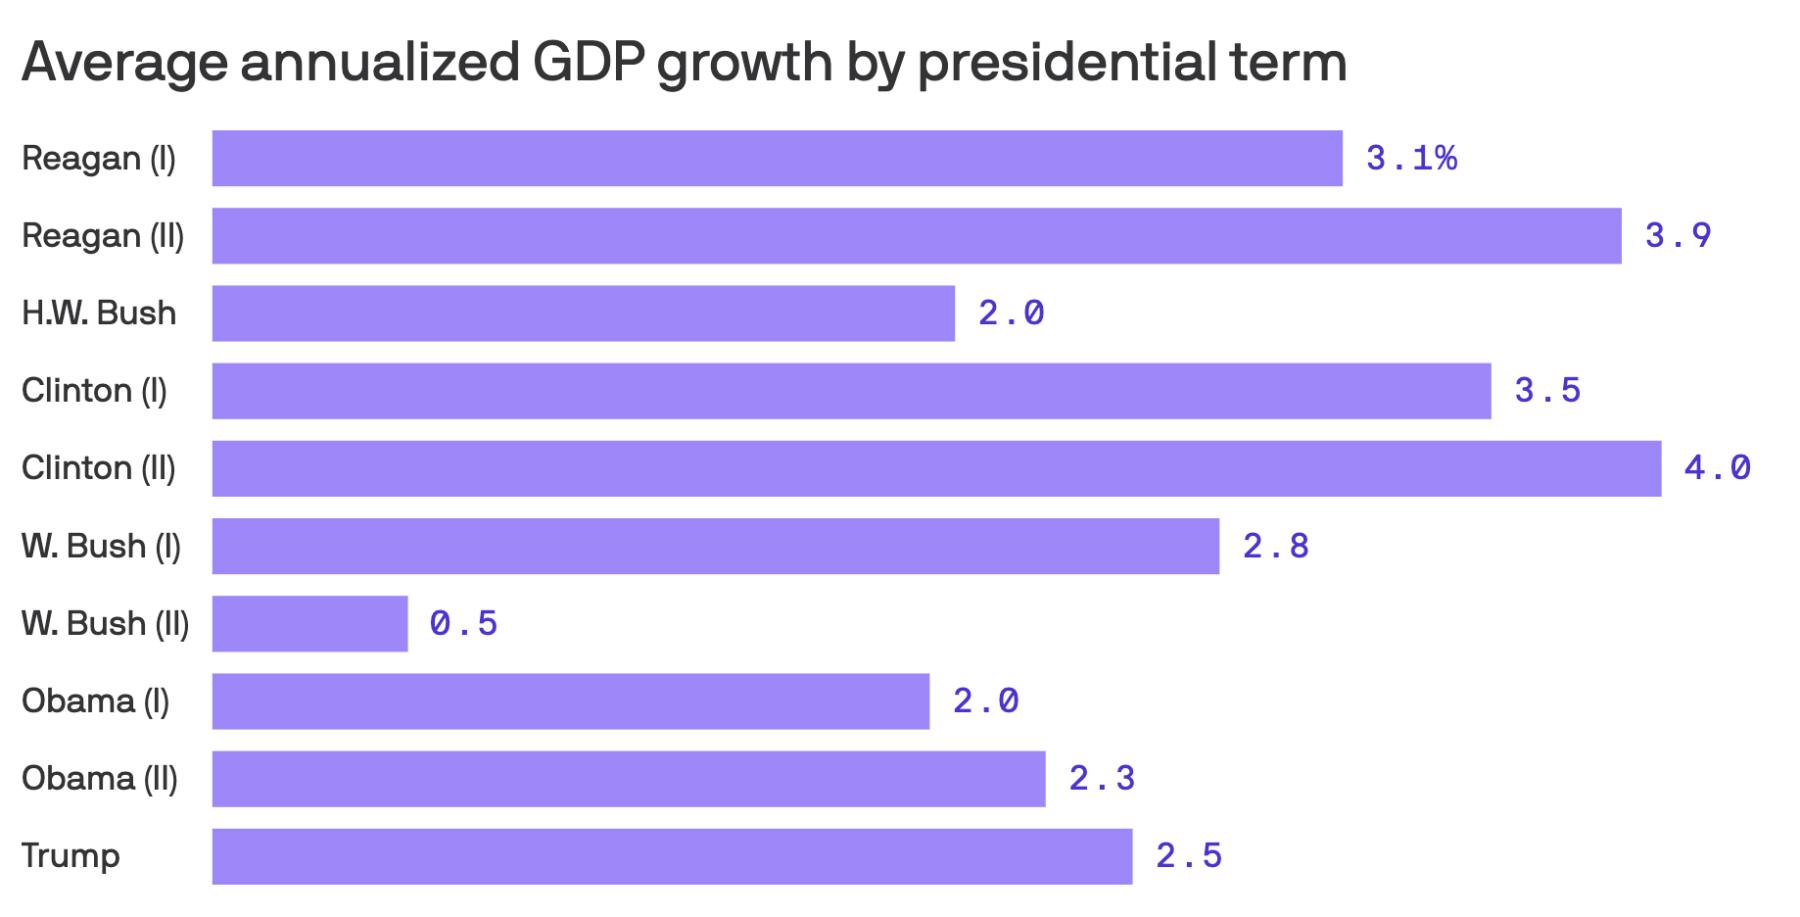 Media anualizada  del PIB de EEUU  desde Reagan